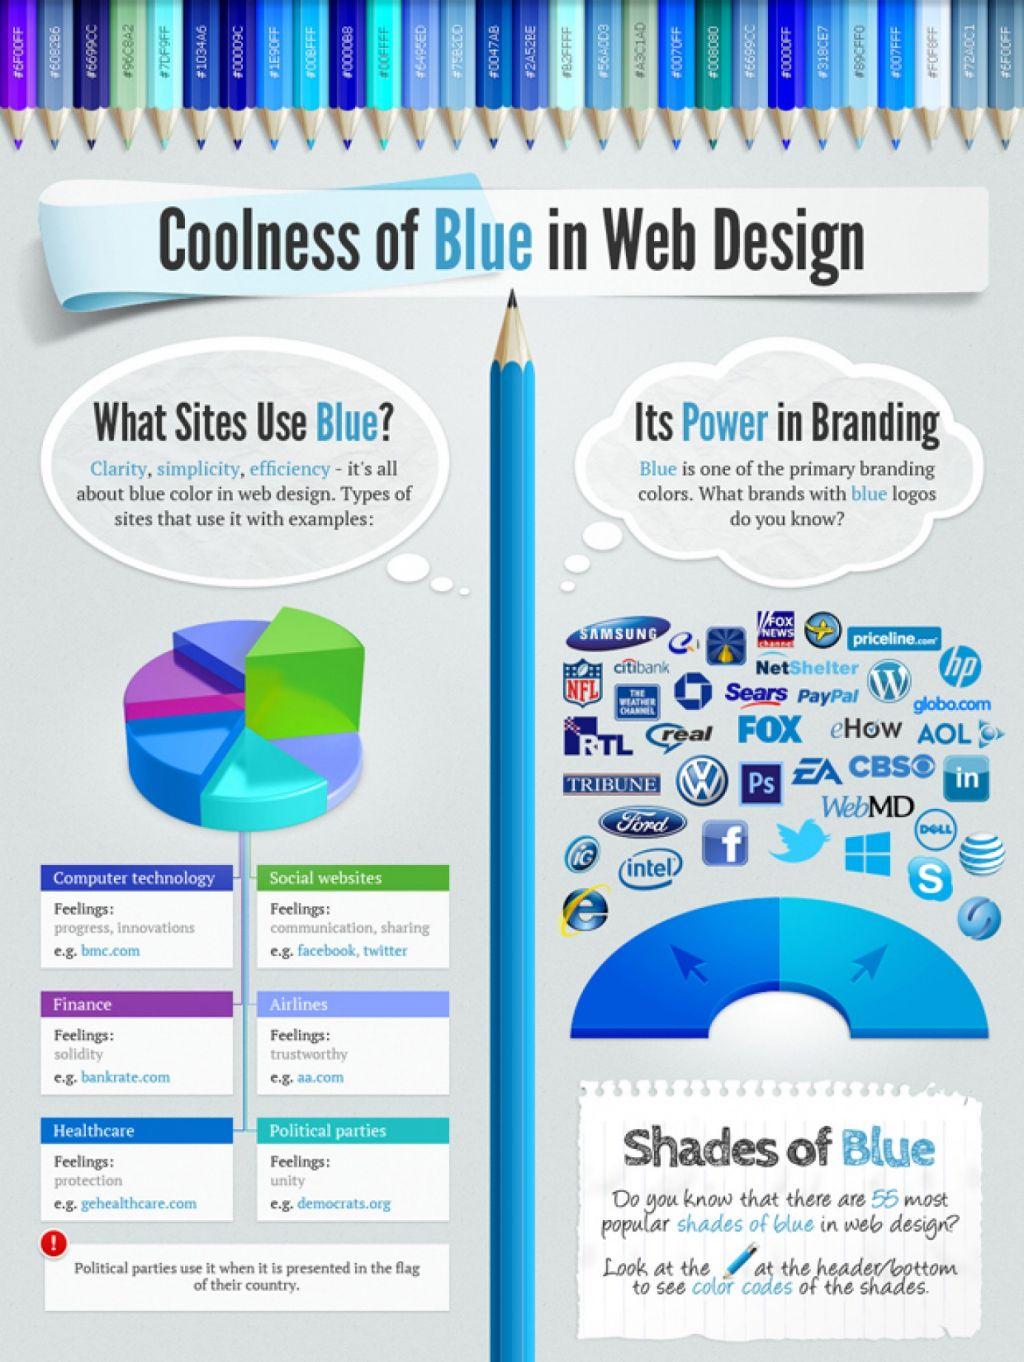 coolness-of-blue-in-web-design_570cc6b642adb_w1500